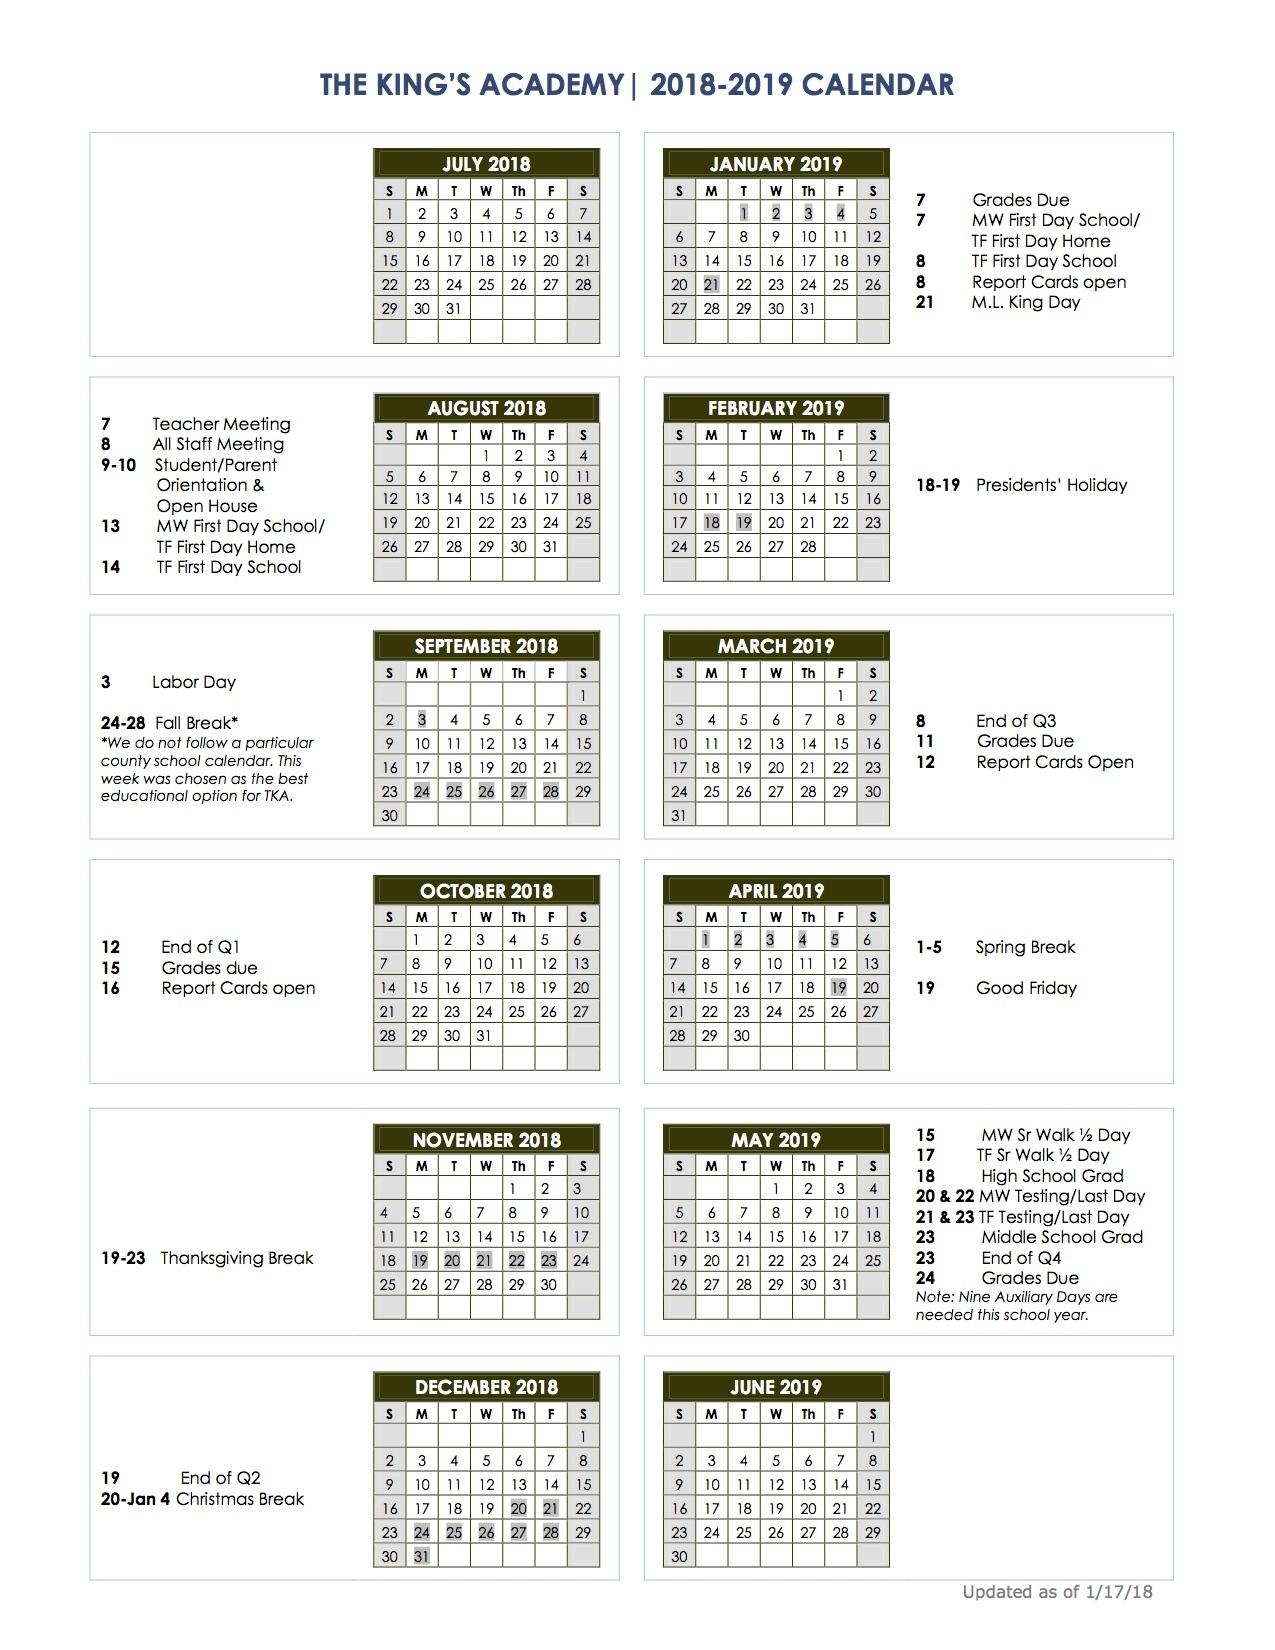 2018-2019 School Calendar - The King's Academy Remarkable School Calendar Charlotte County